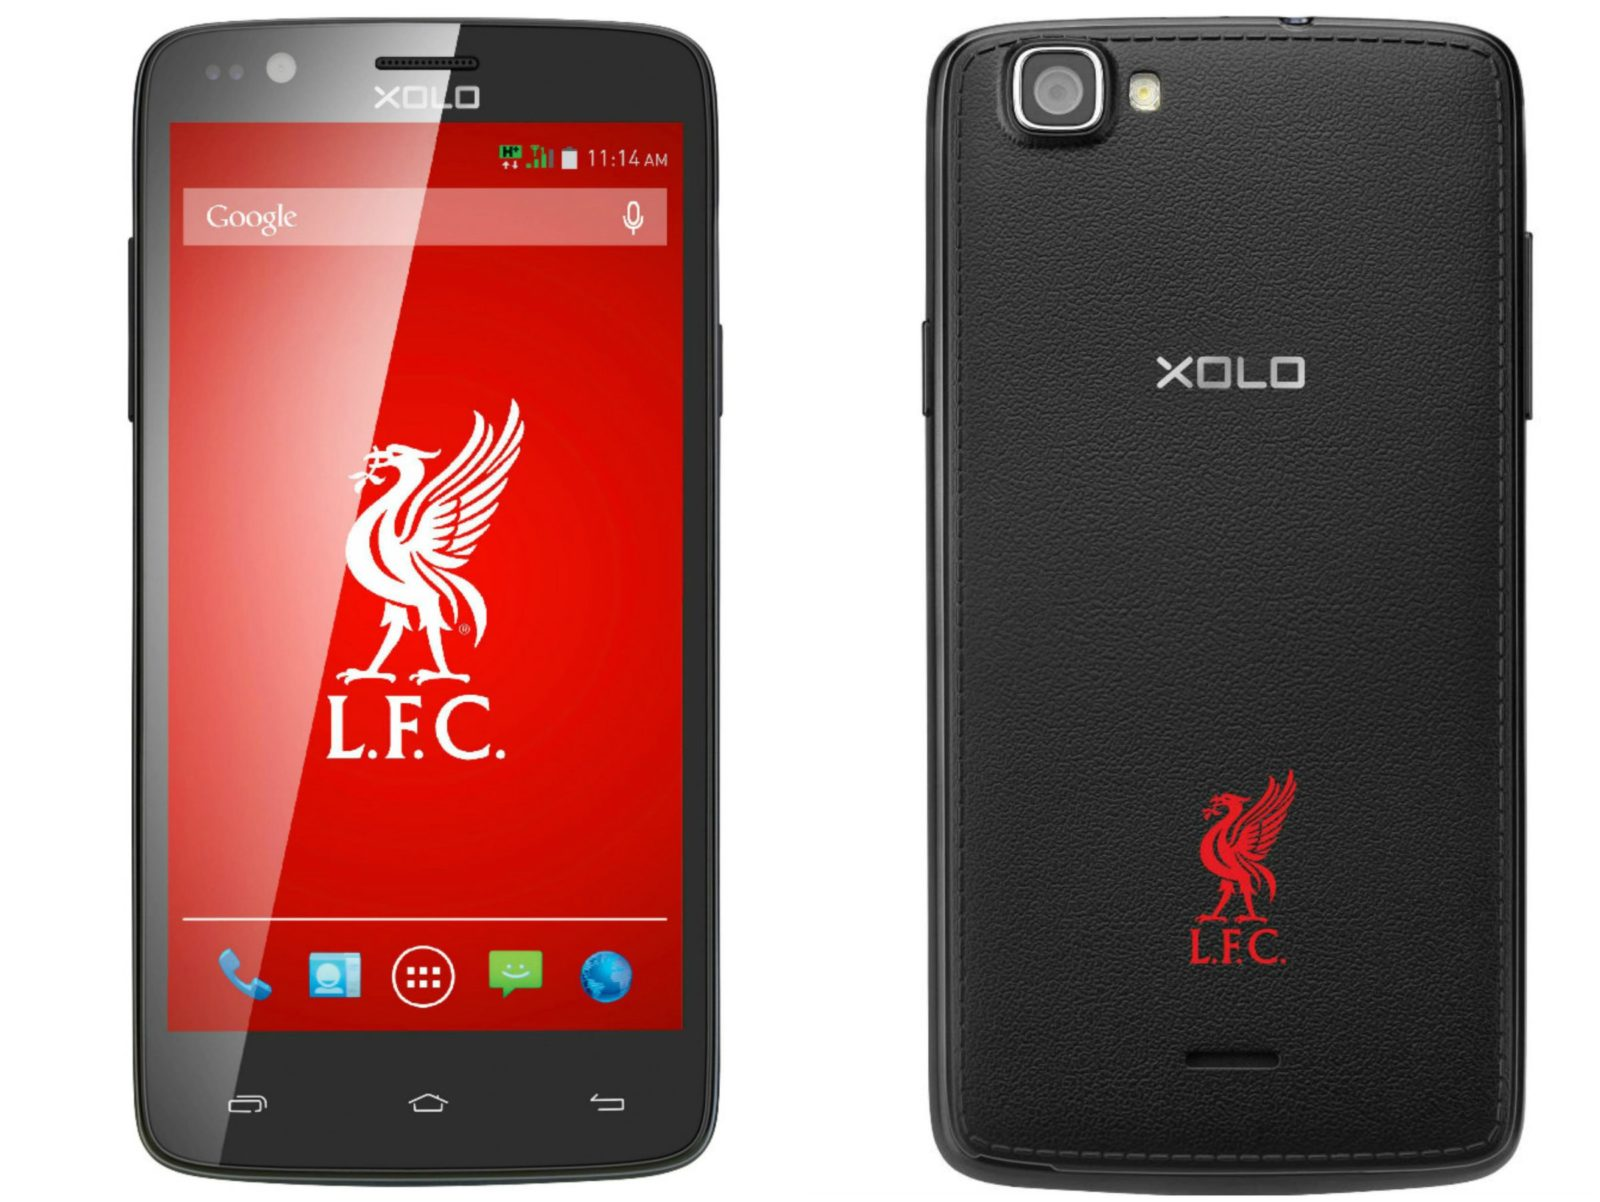 LFC Xolo One